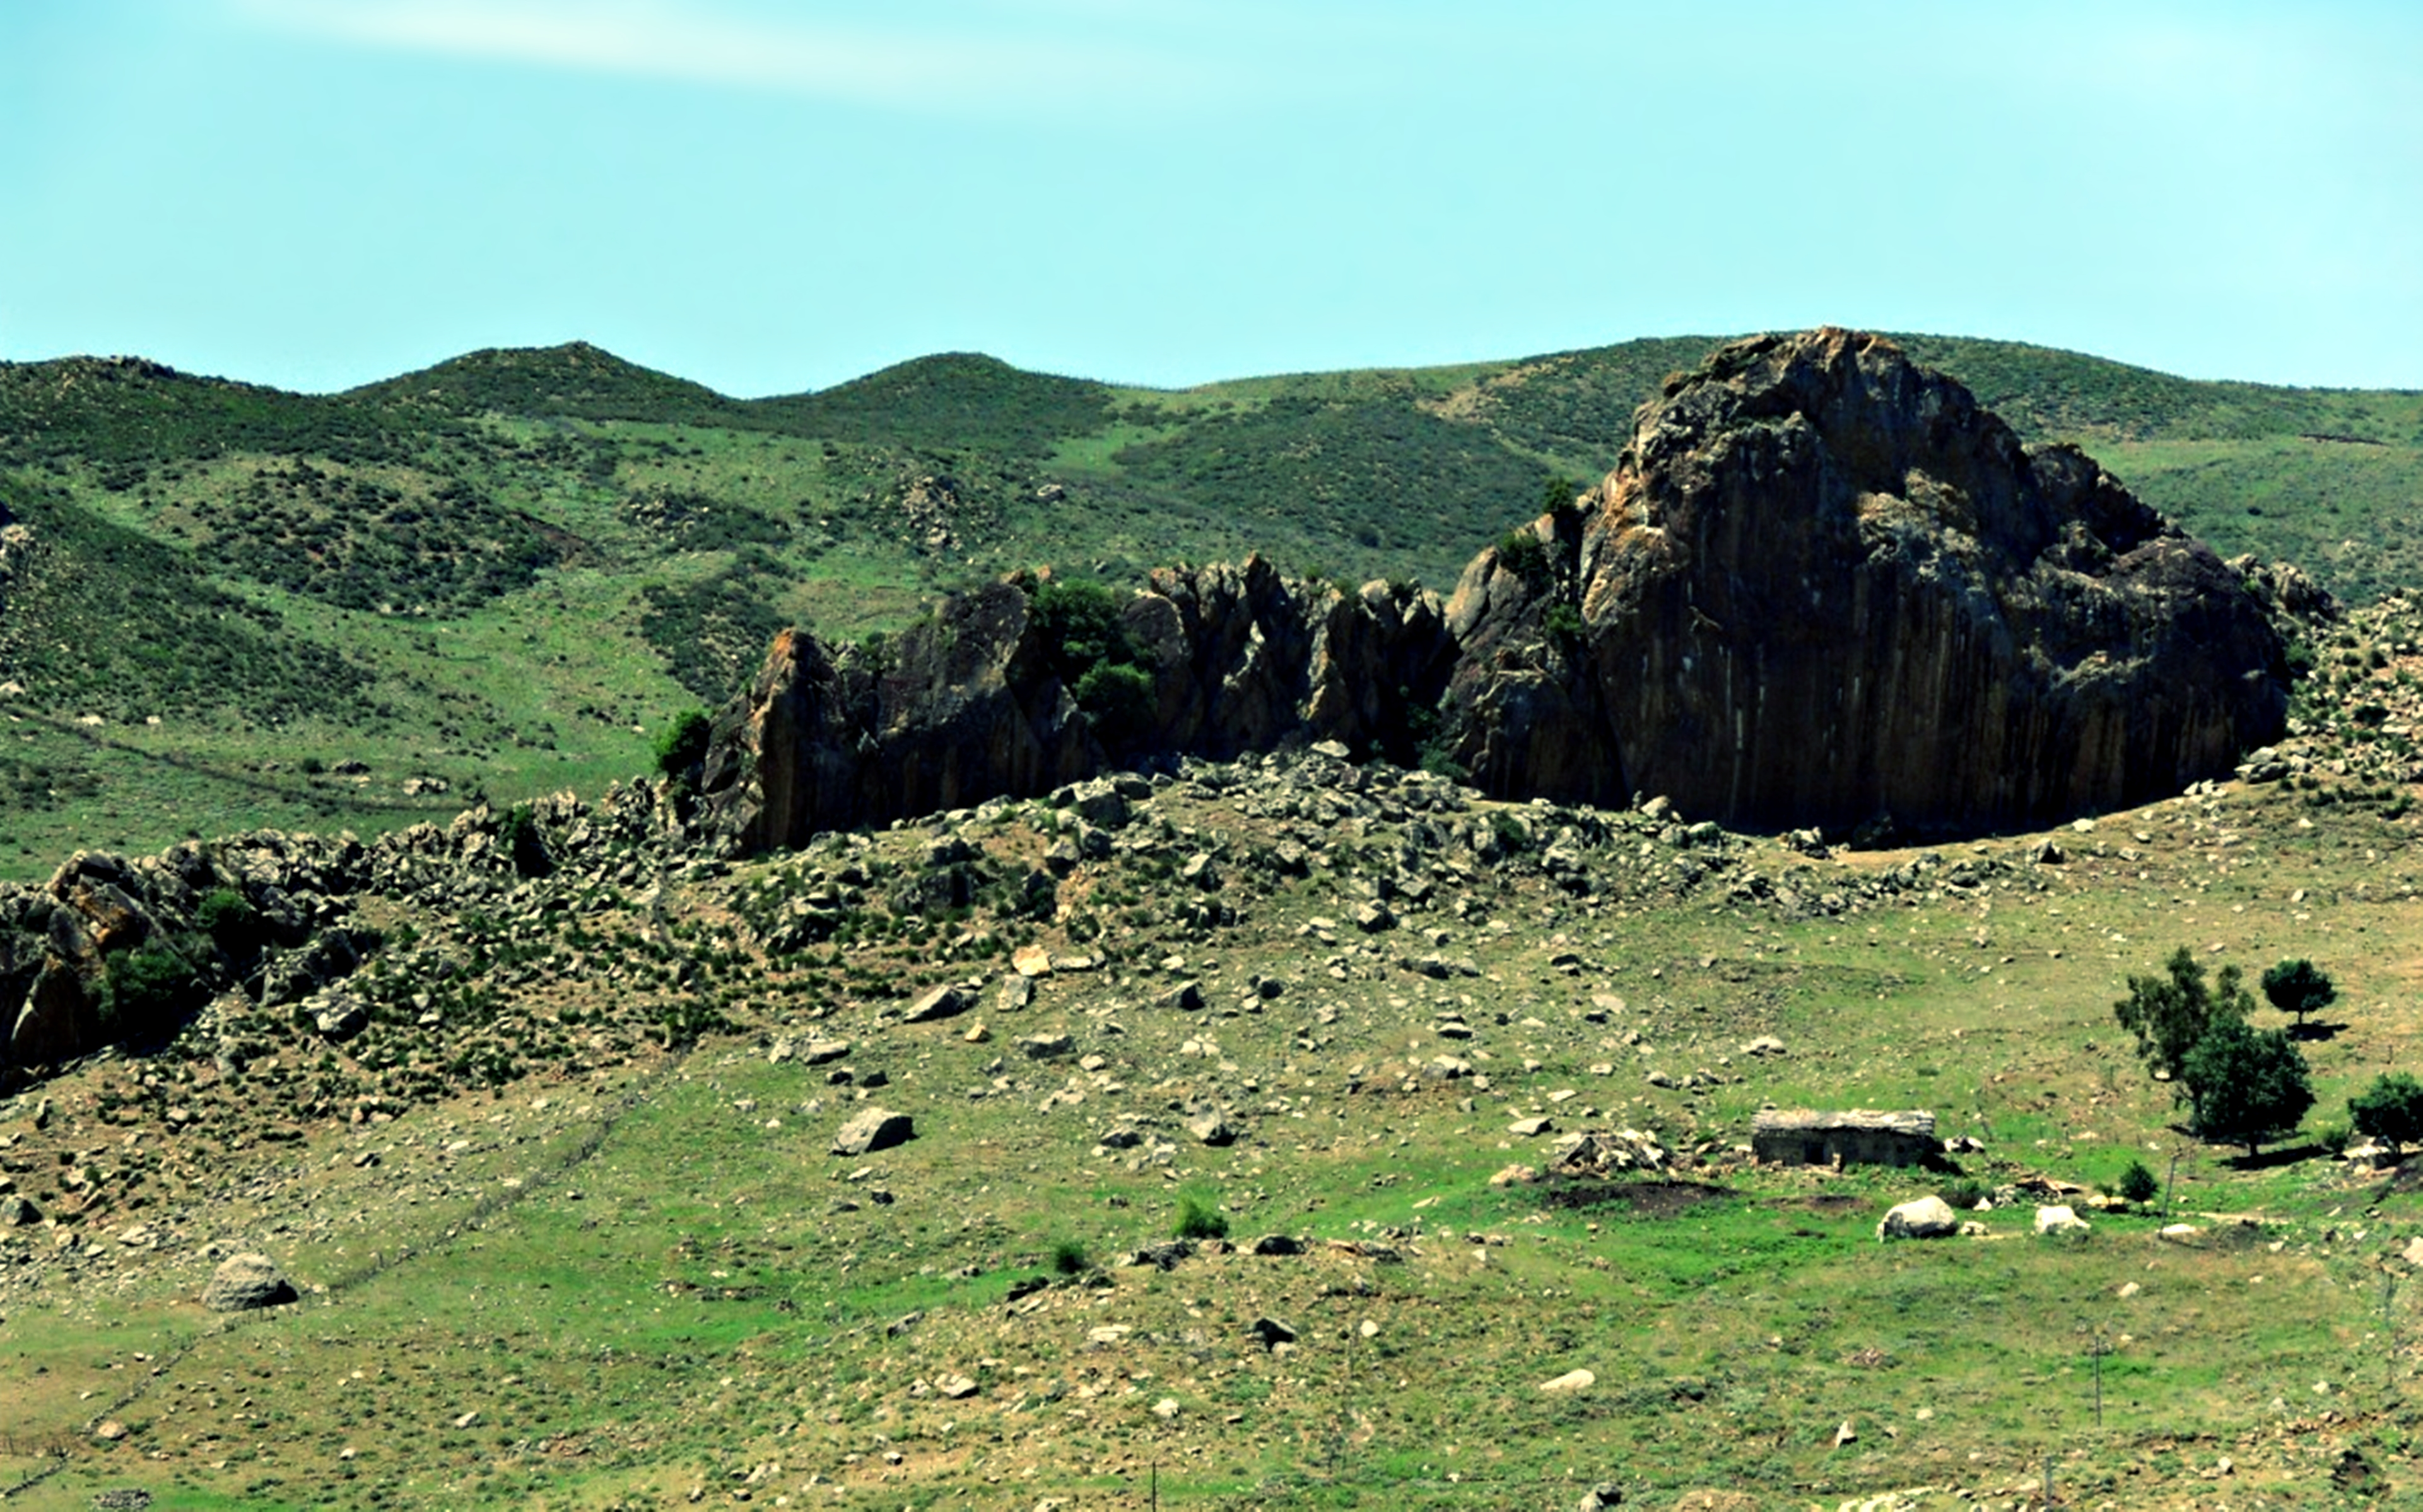 Landscape Hill Algeria Africa Mountain Earth Nature 3841x2397